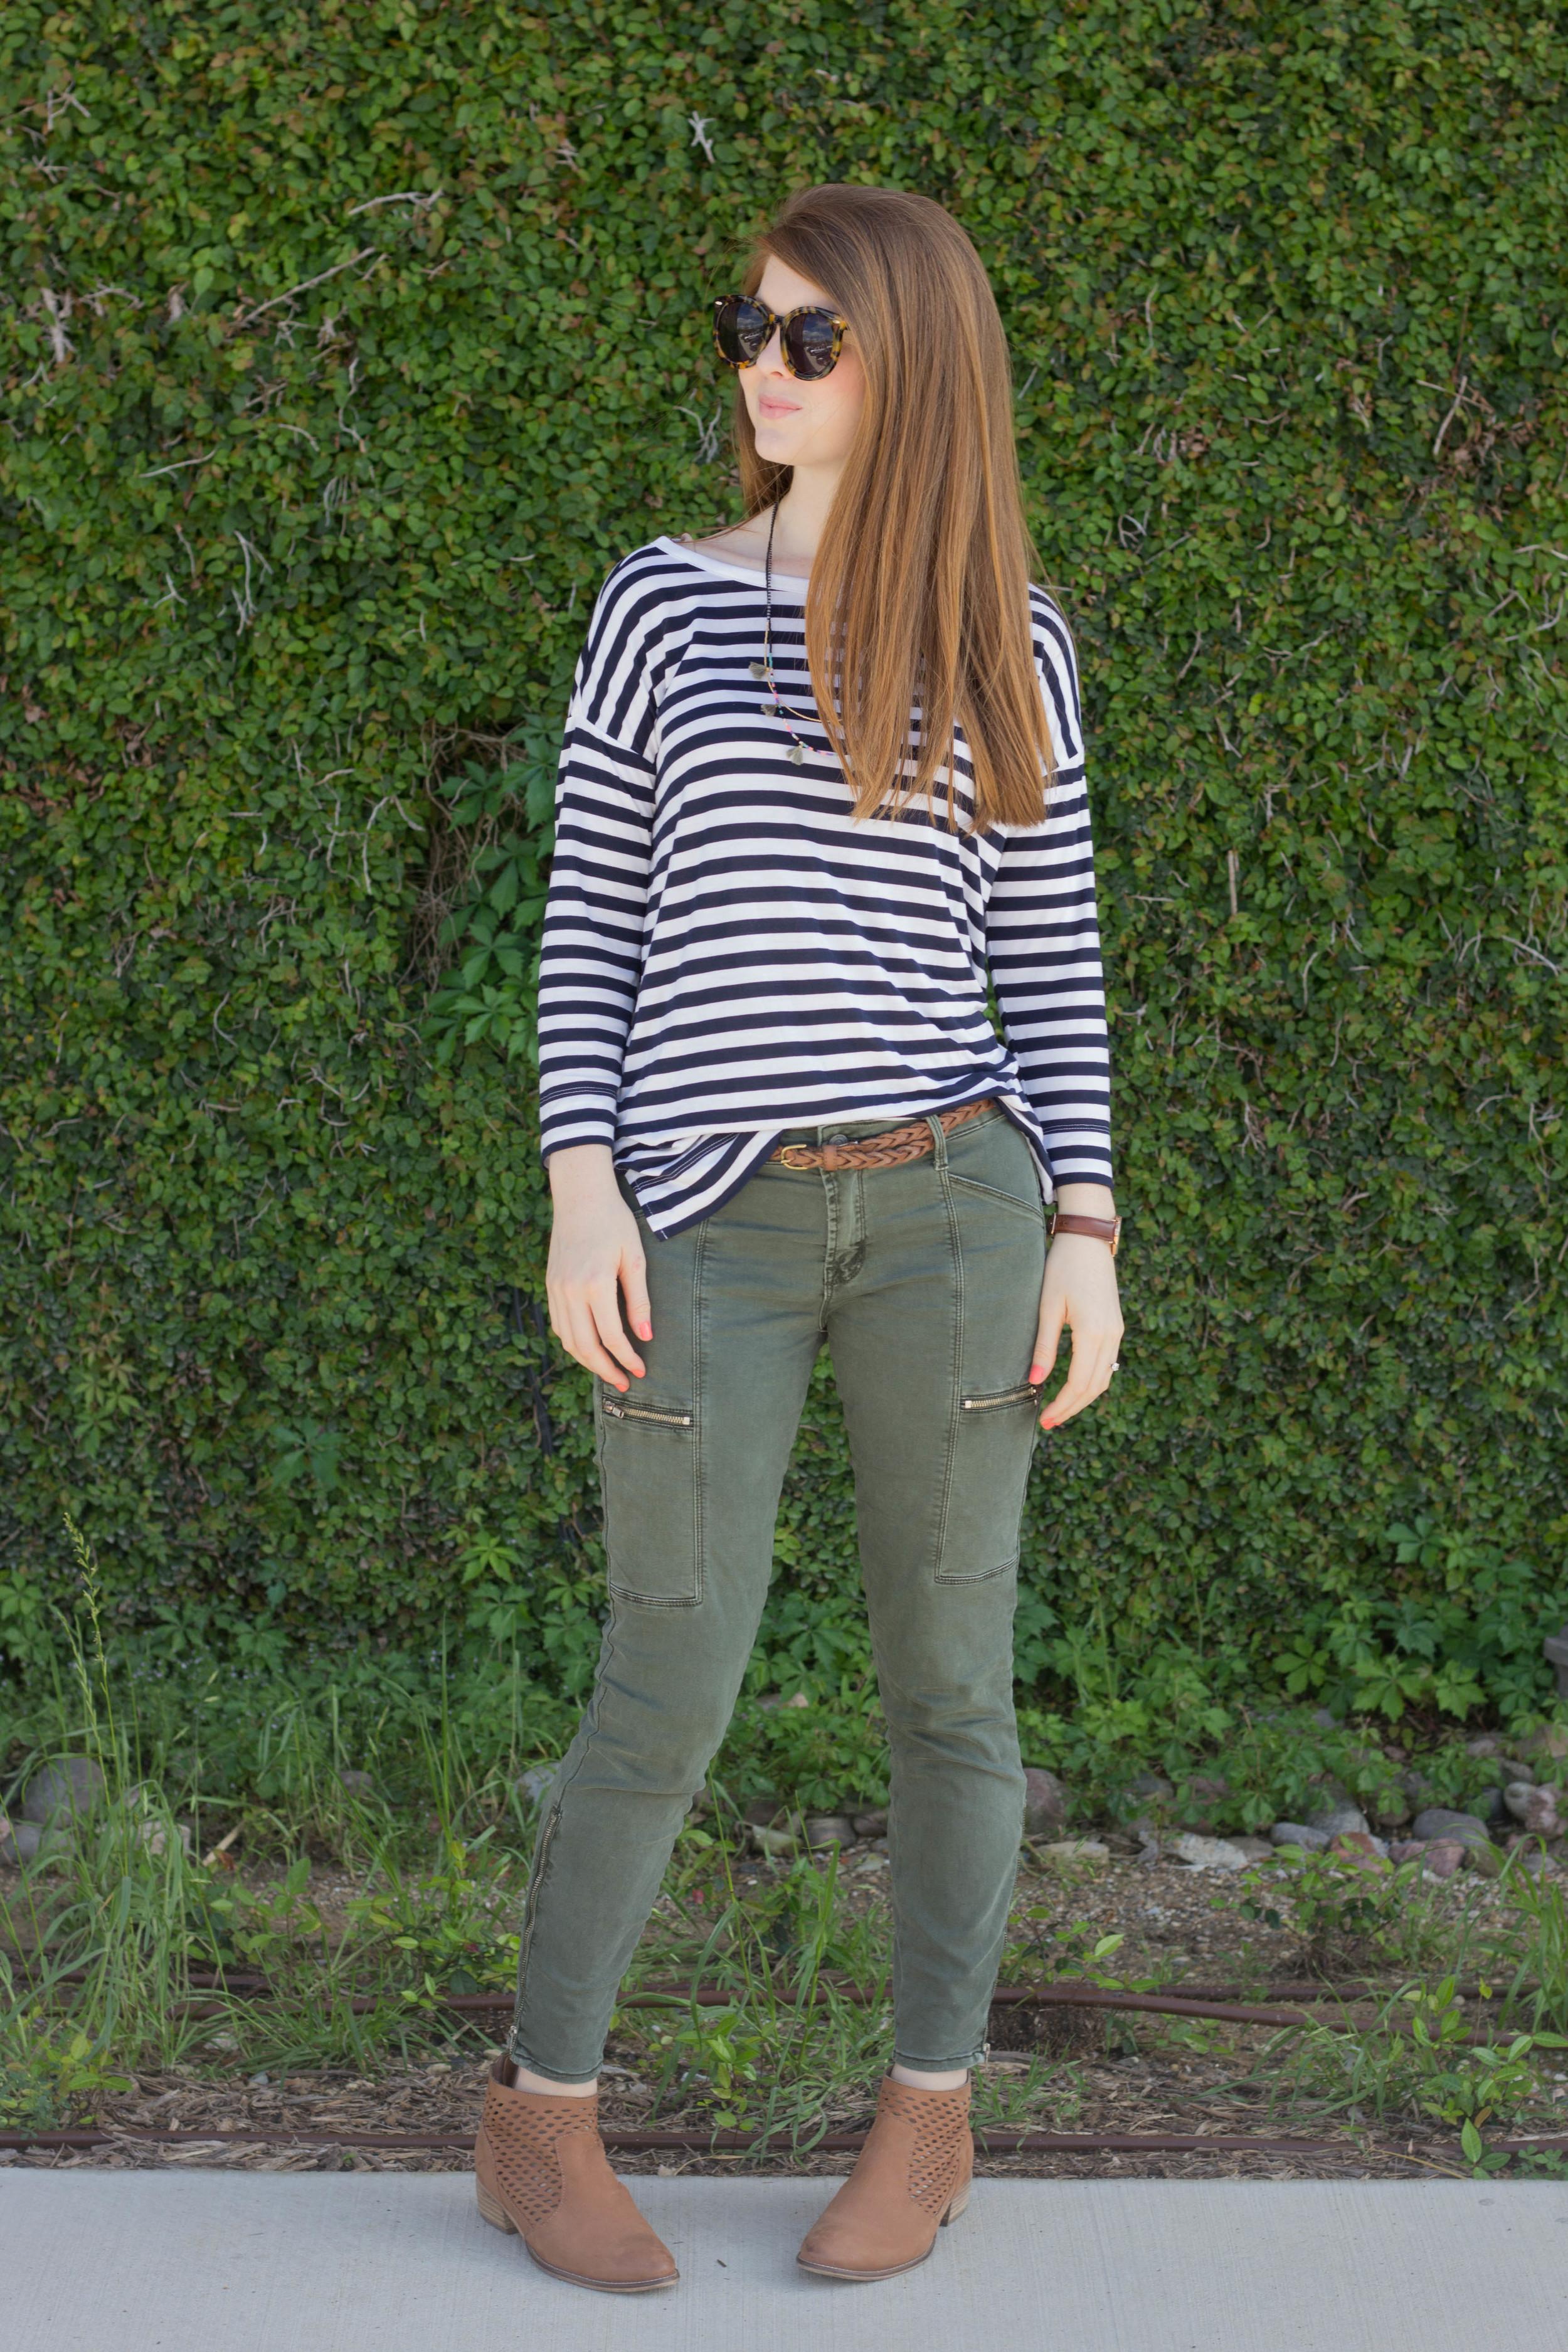 karen walker sunglasses, loft striped dolman tee, olive green pants, shashi tassel necklace